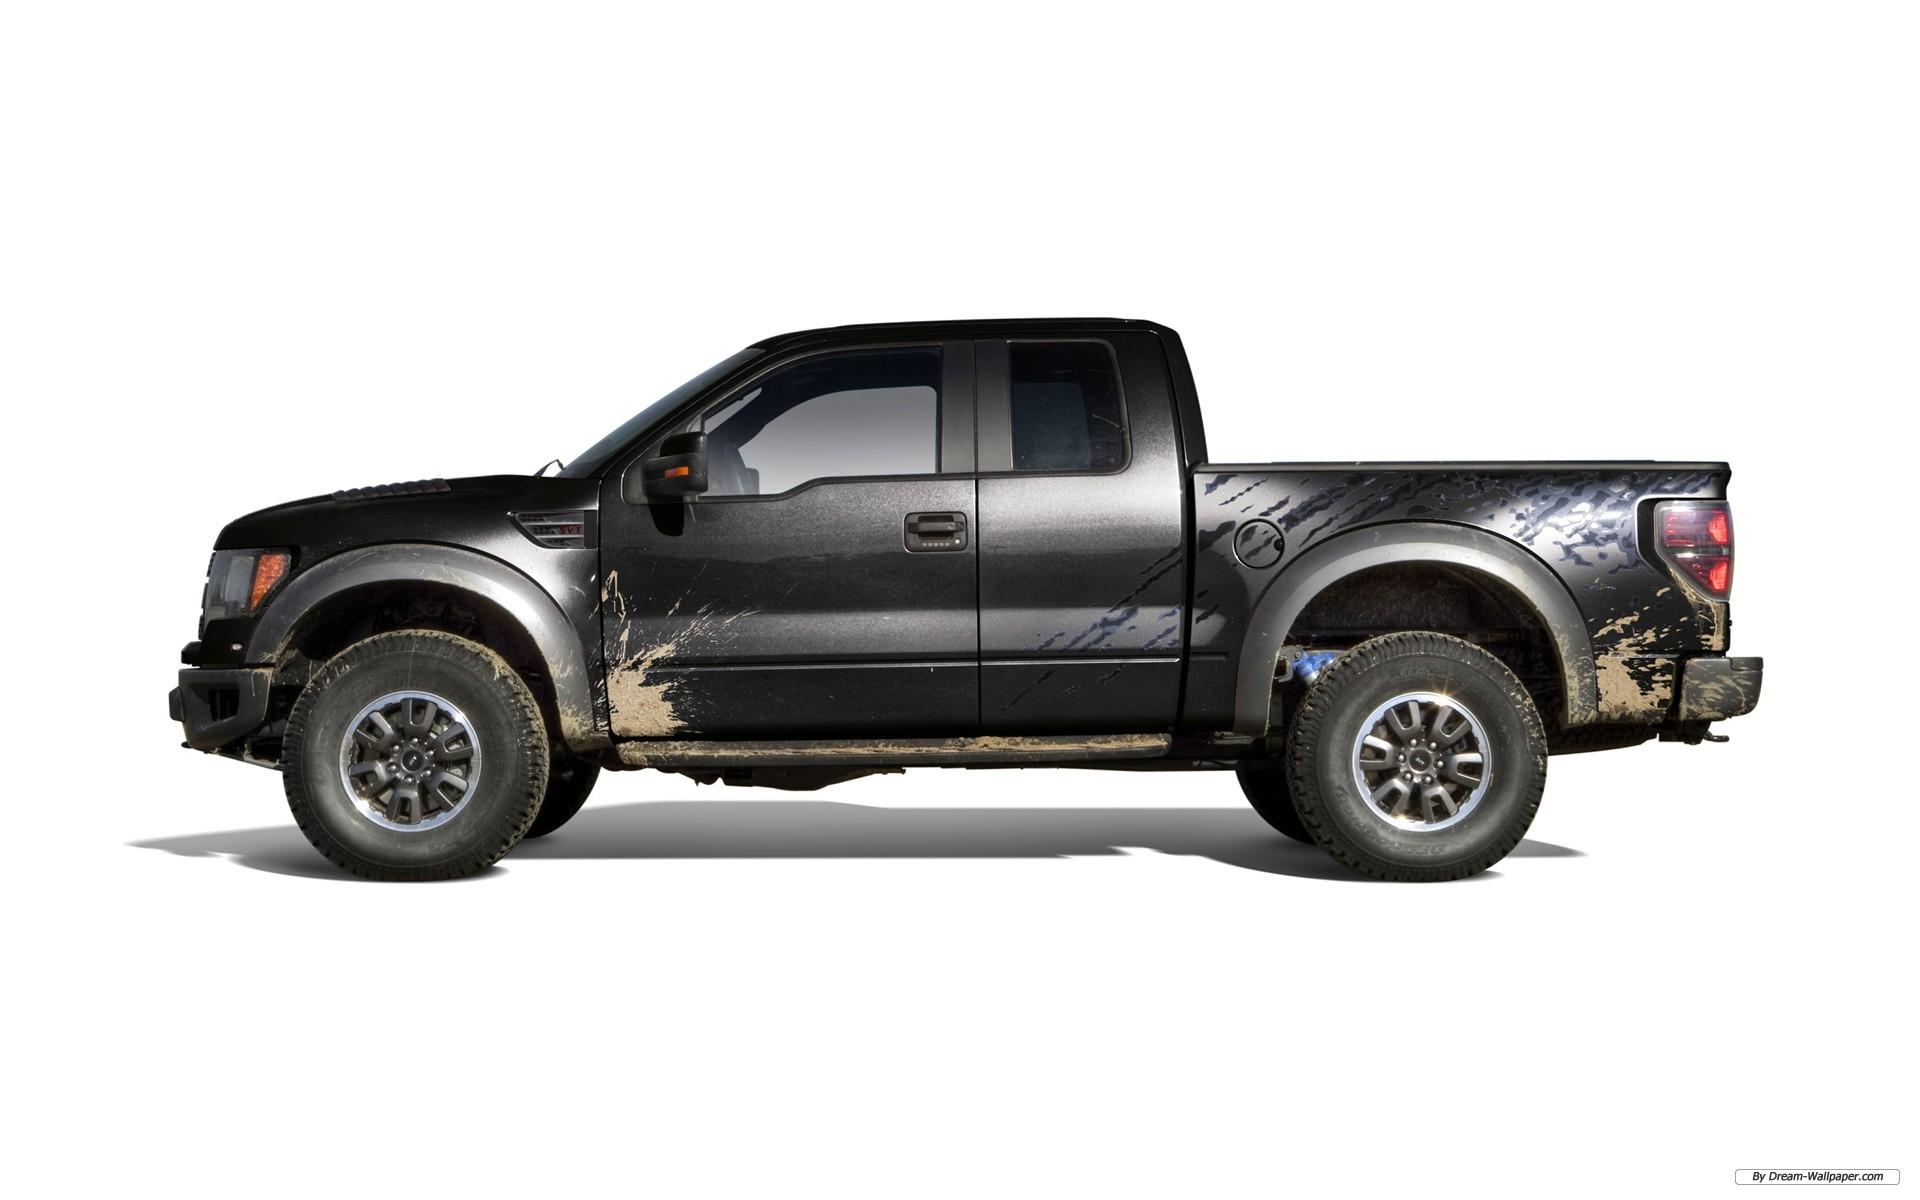 Ford Raptor wallpaper   291533 1920x1200